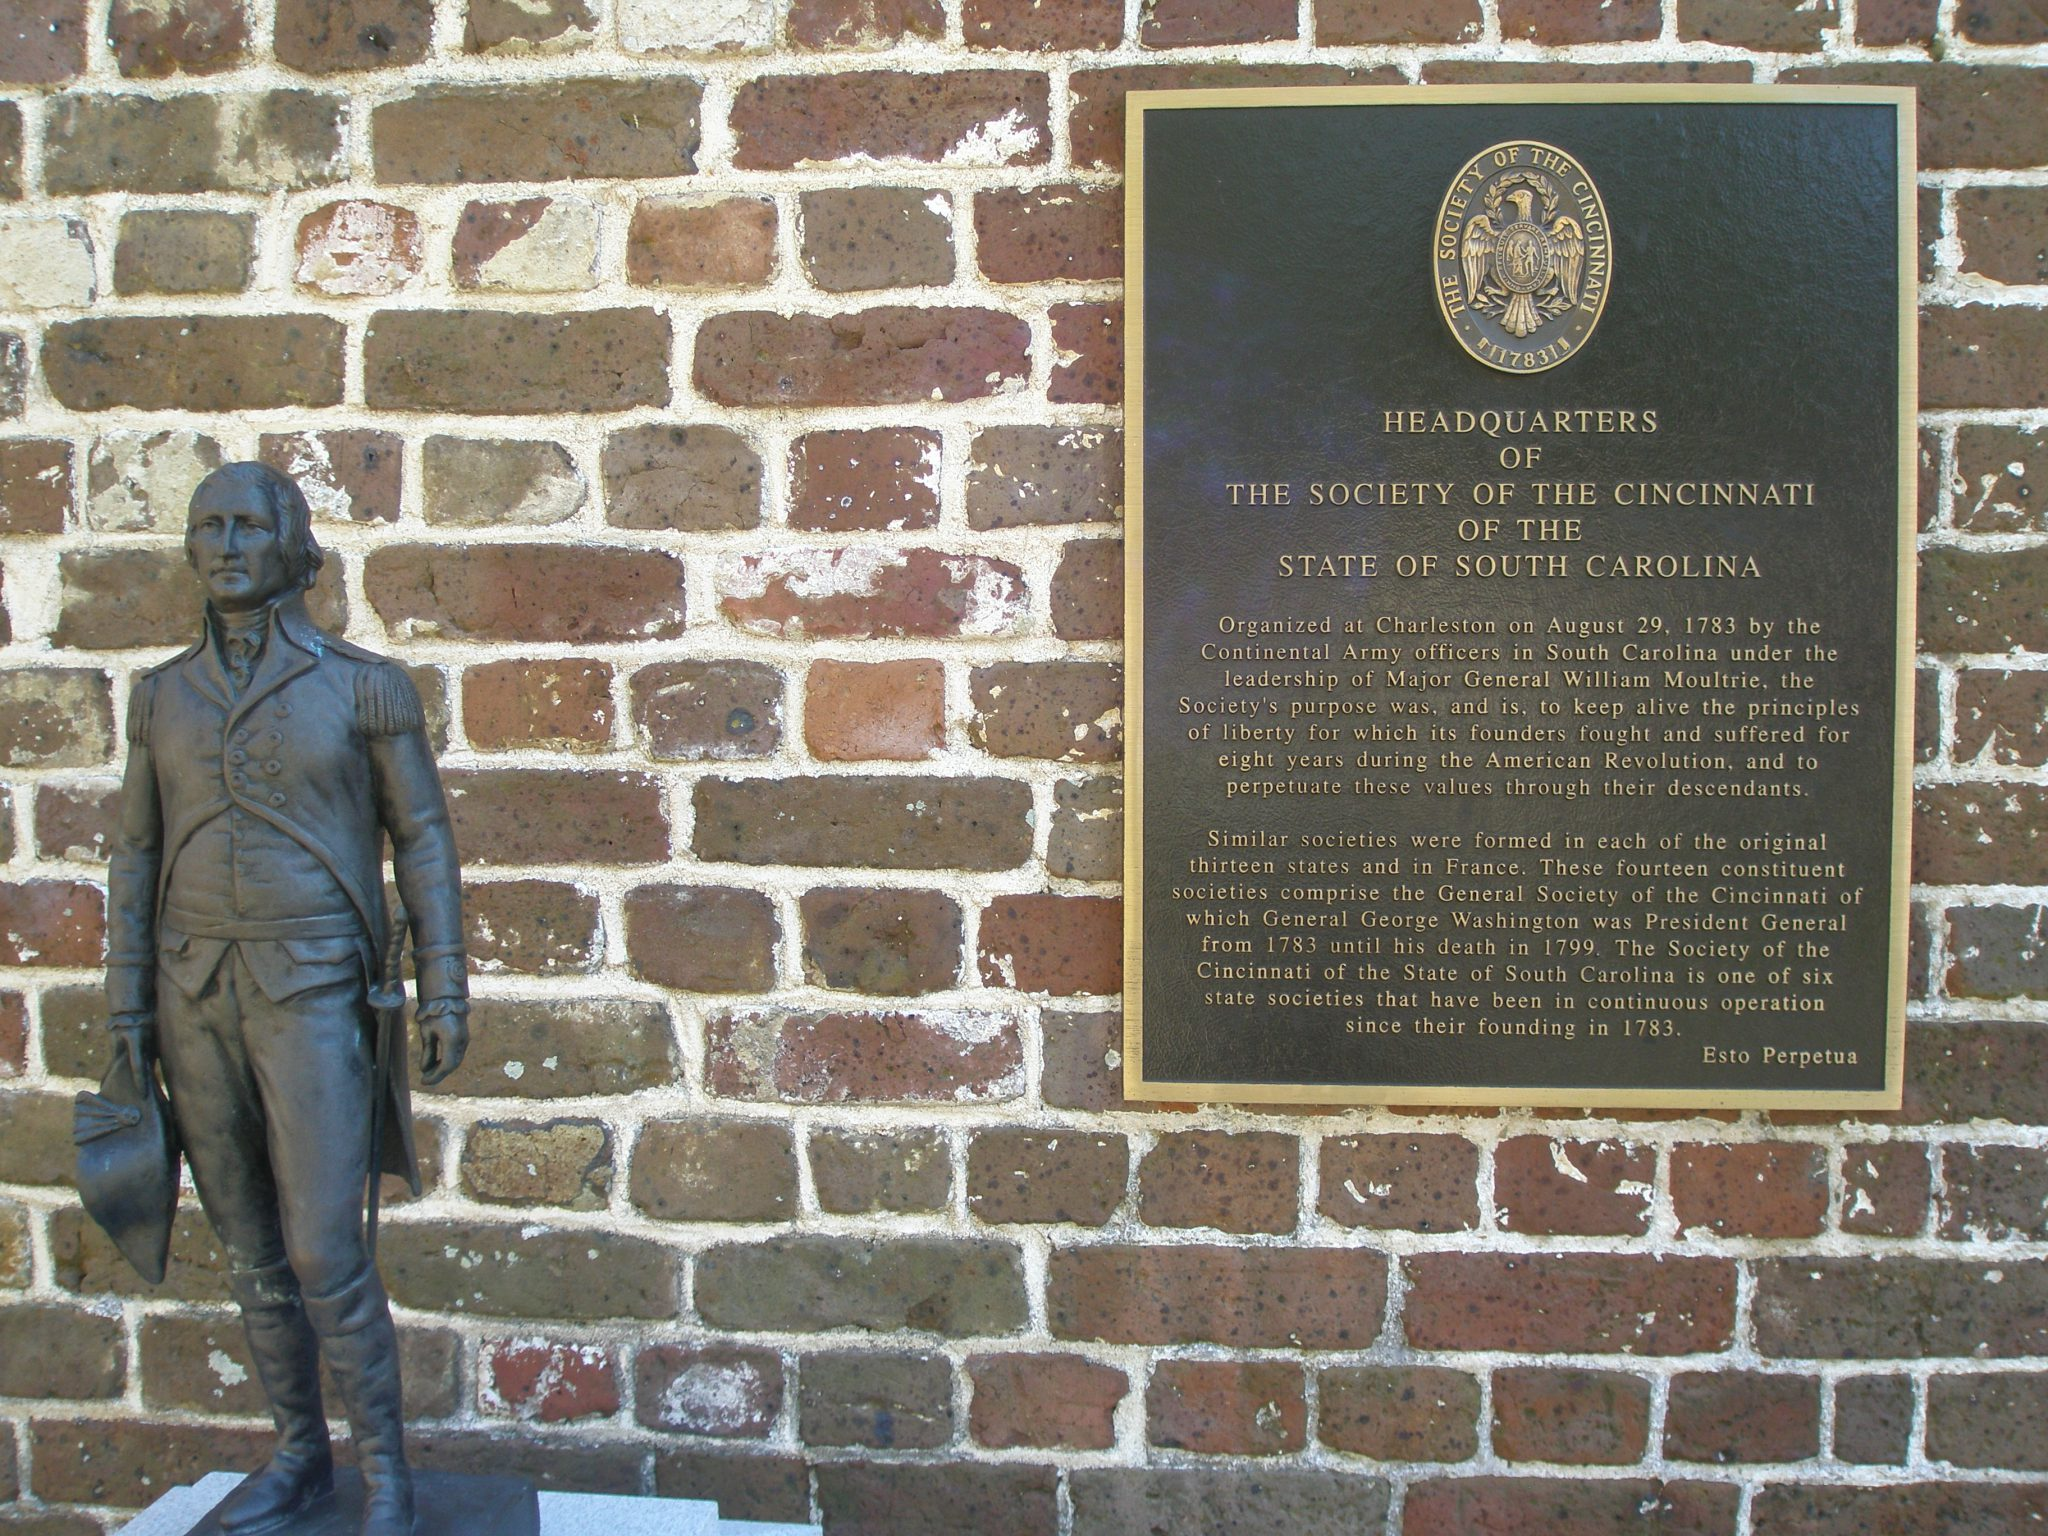 The Society of the Cincinnati has planted its flag at the Heyward-Washington House.